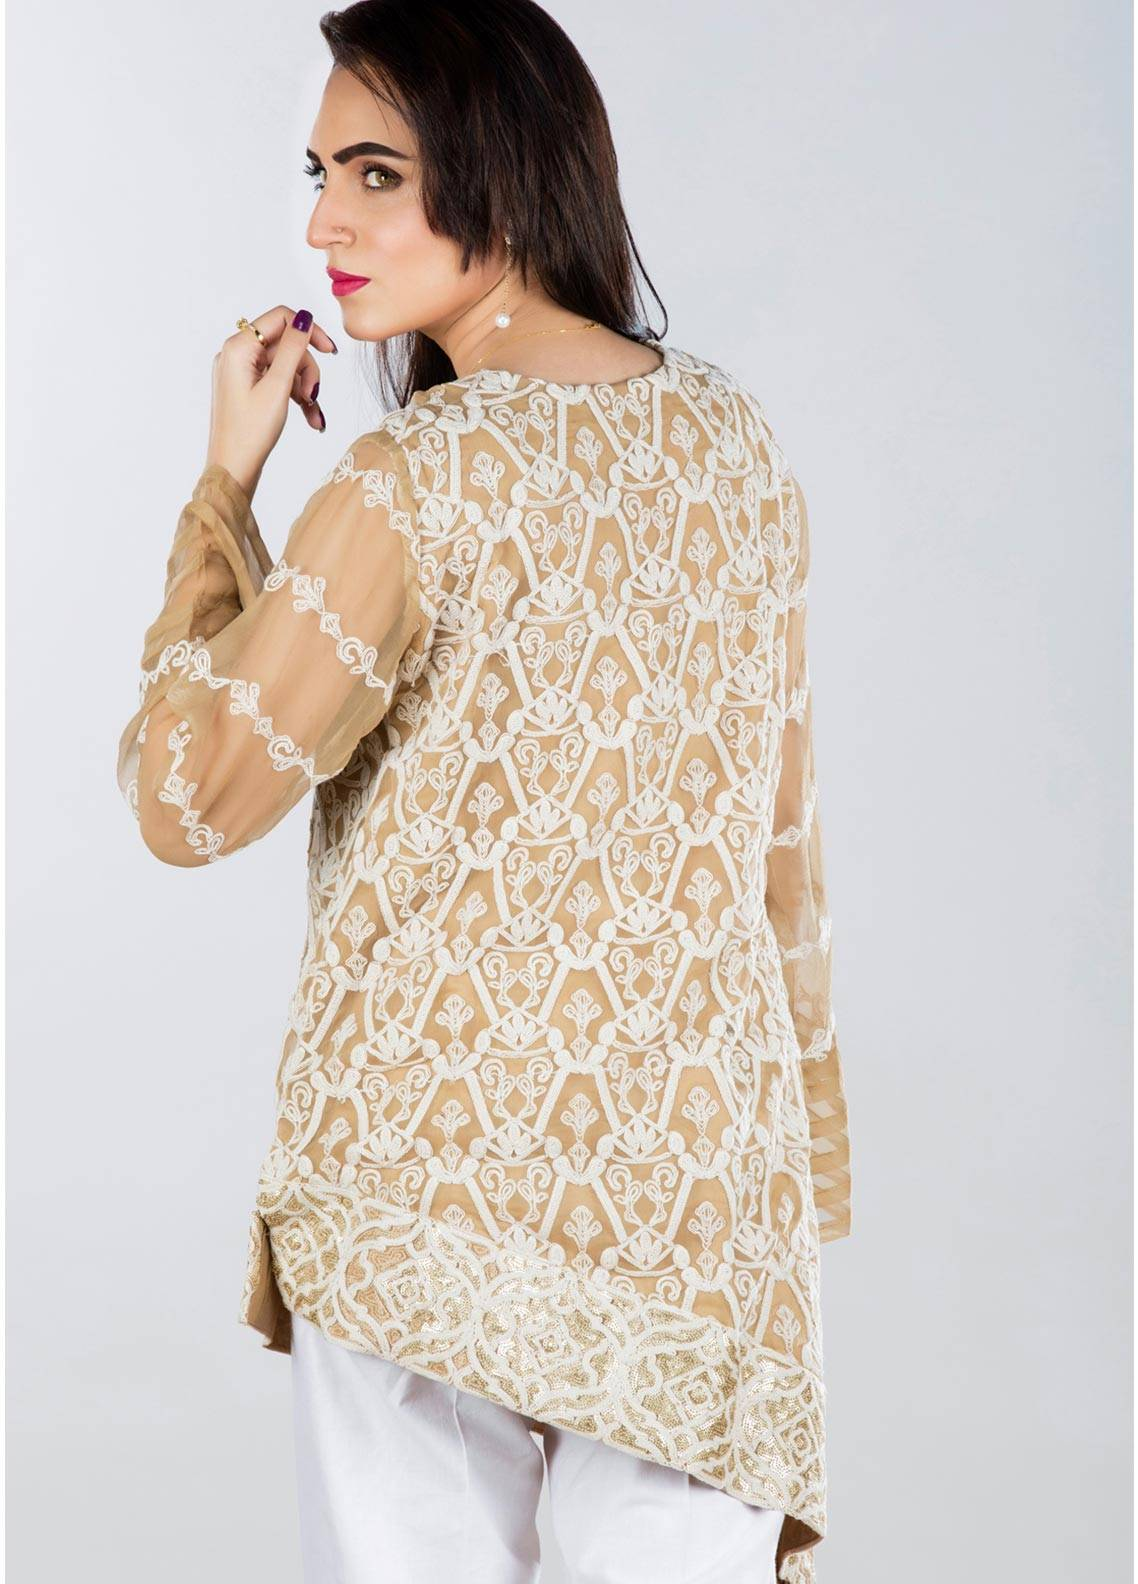 Sheqe Embroidered  Stitched Kurtis SHQ18K C-009 FAWN